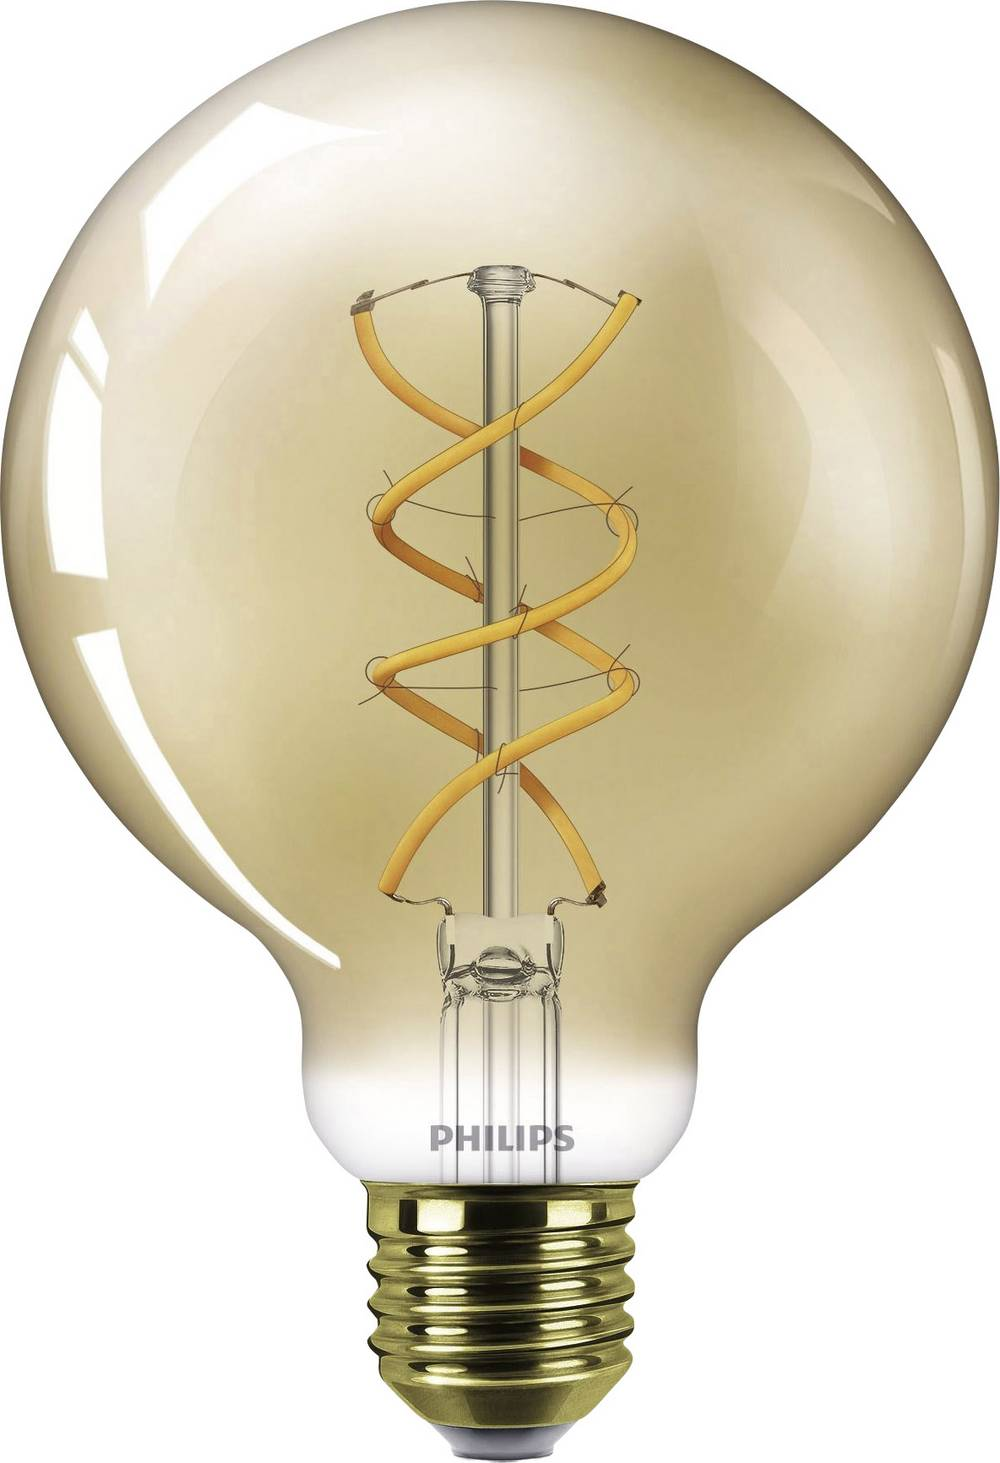 LED Globform E27 Philips Lighting Filament 5 W 250 lm A Guld 1 st